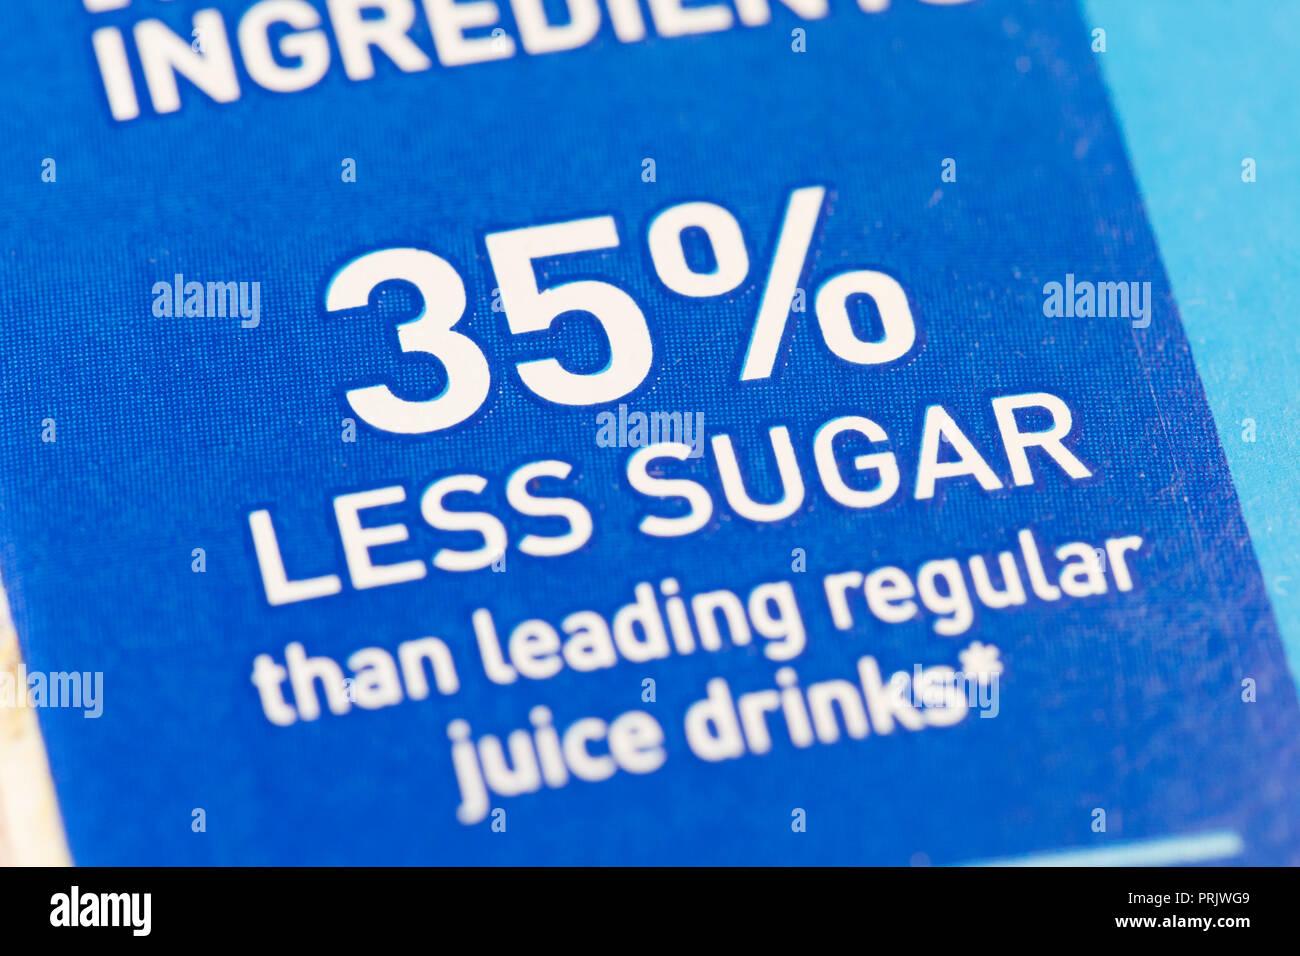 '35% less sugar than leading regular juice drinks' claim on juice packaging - USA - Stock Image